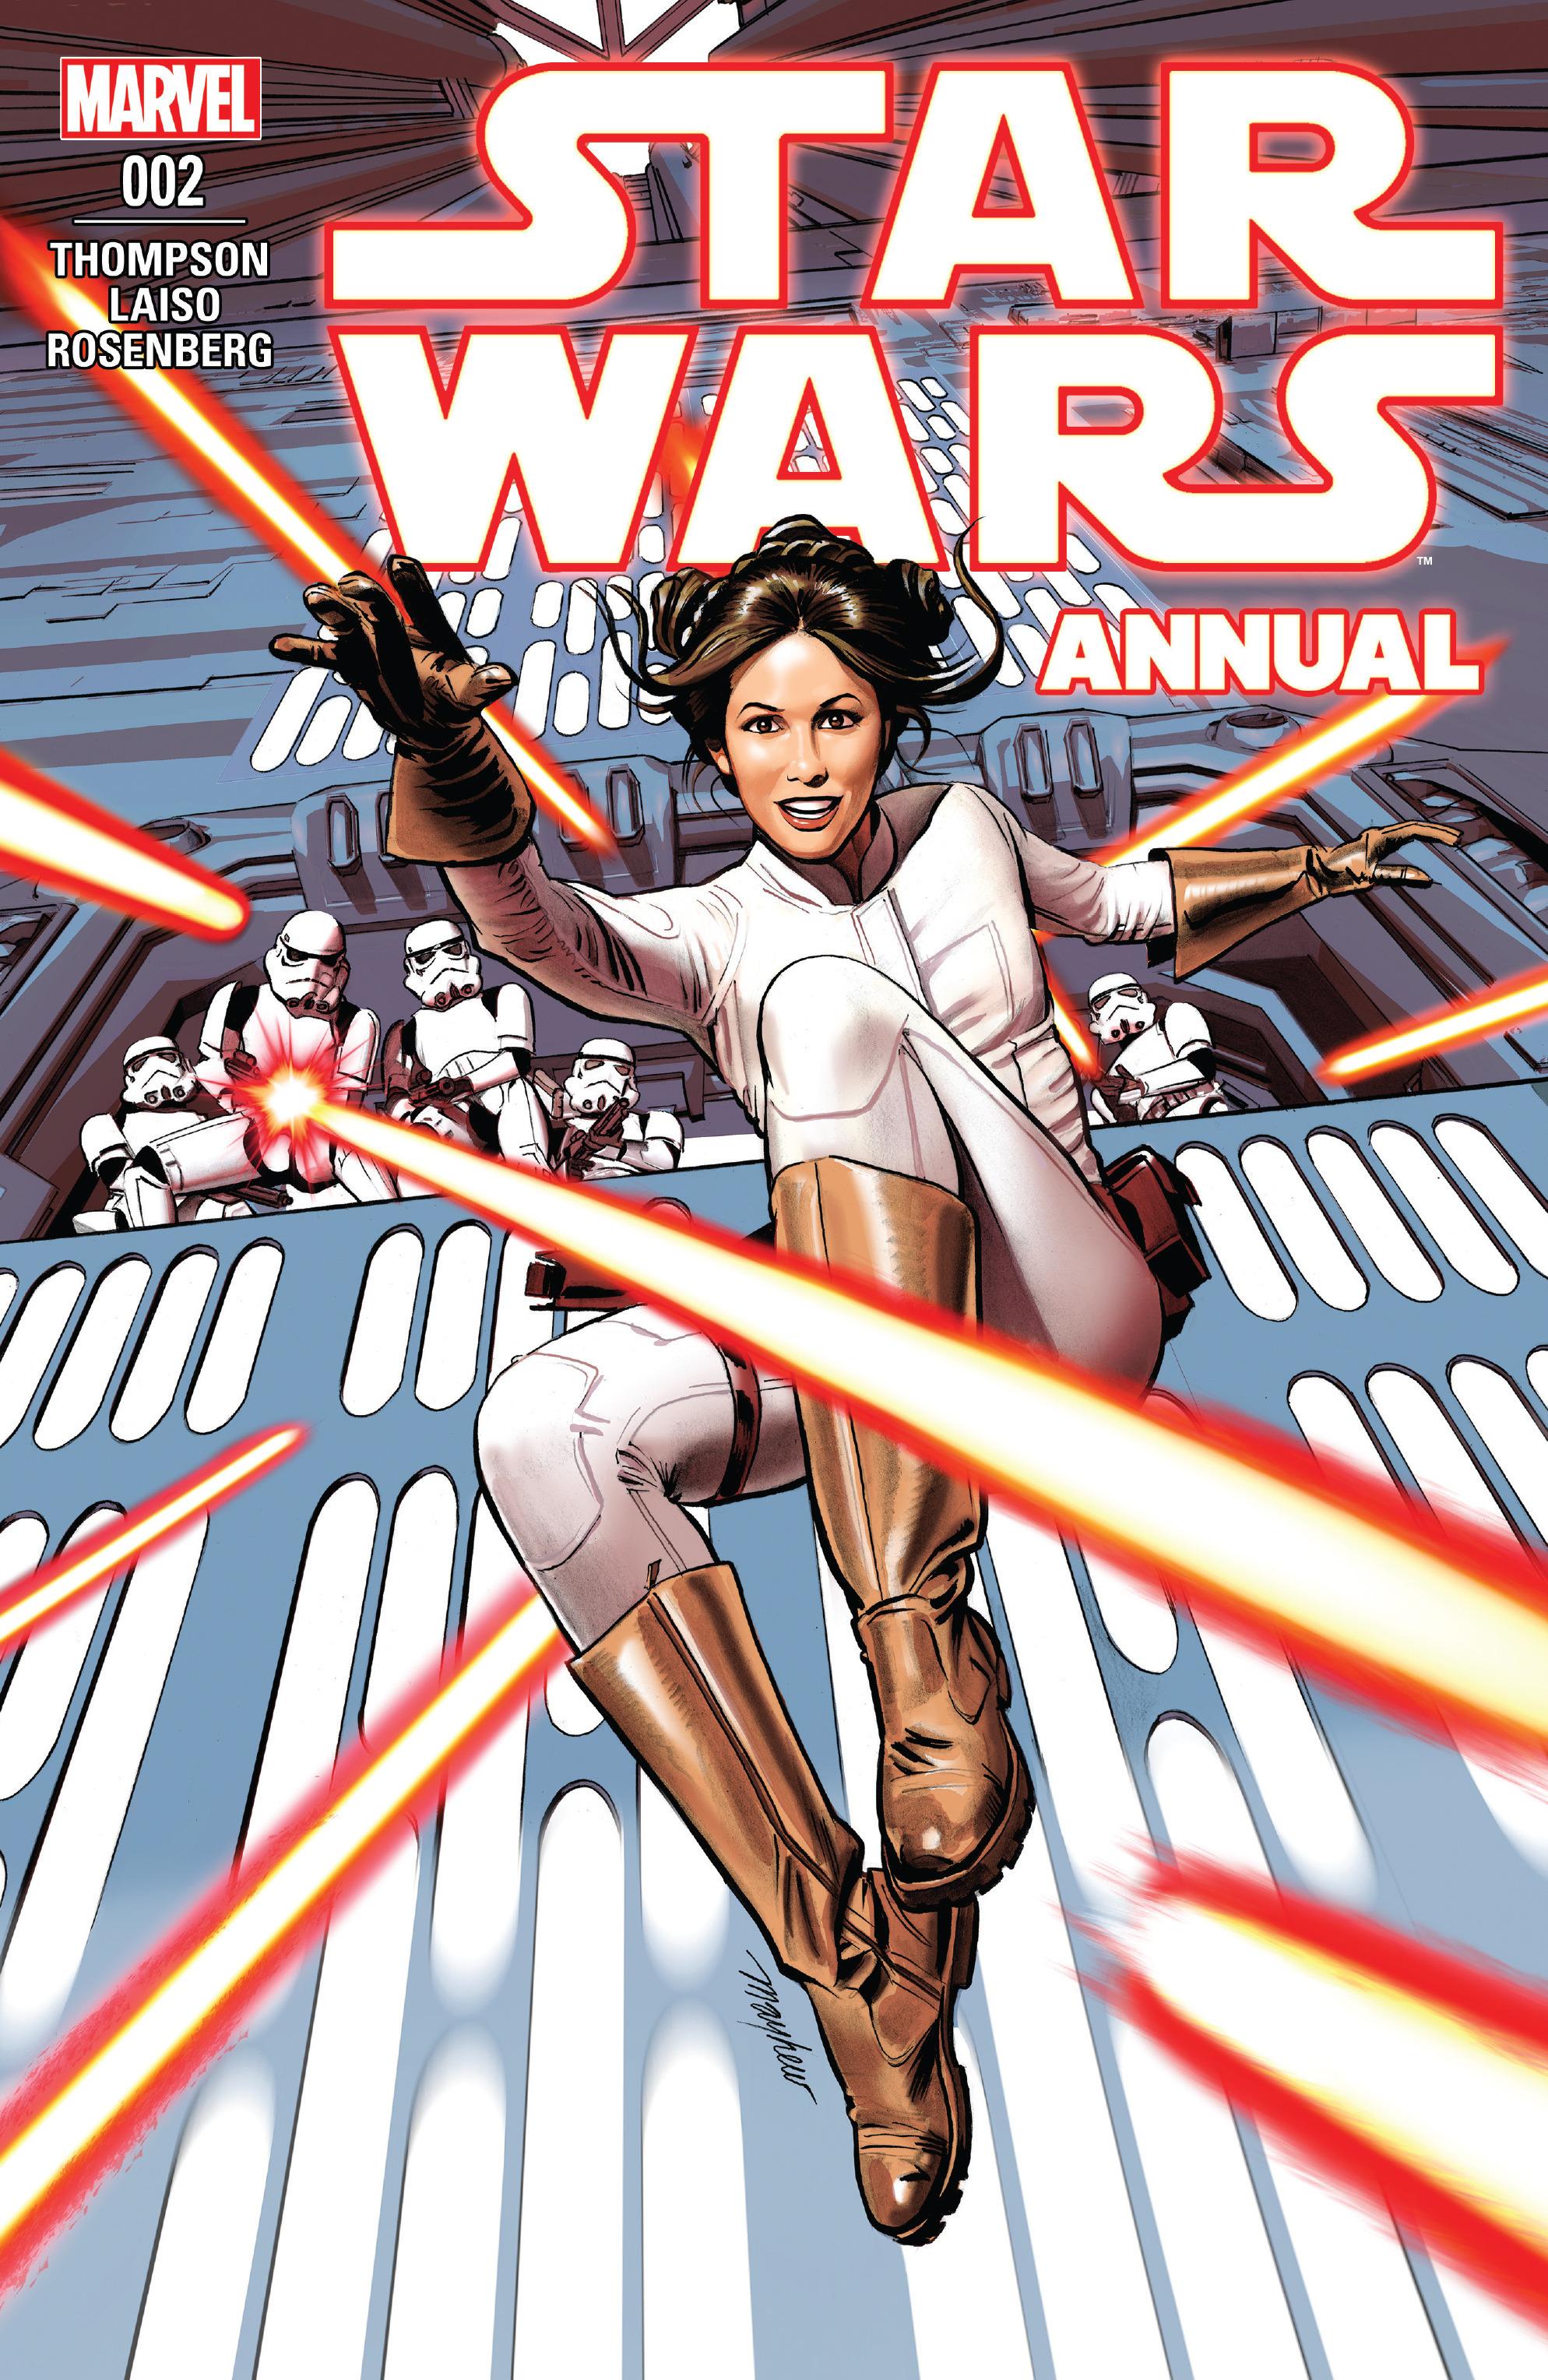 Star Wars 2015 Annual 002 000